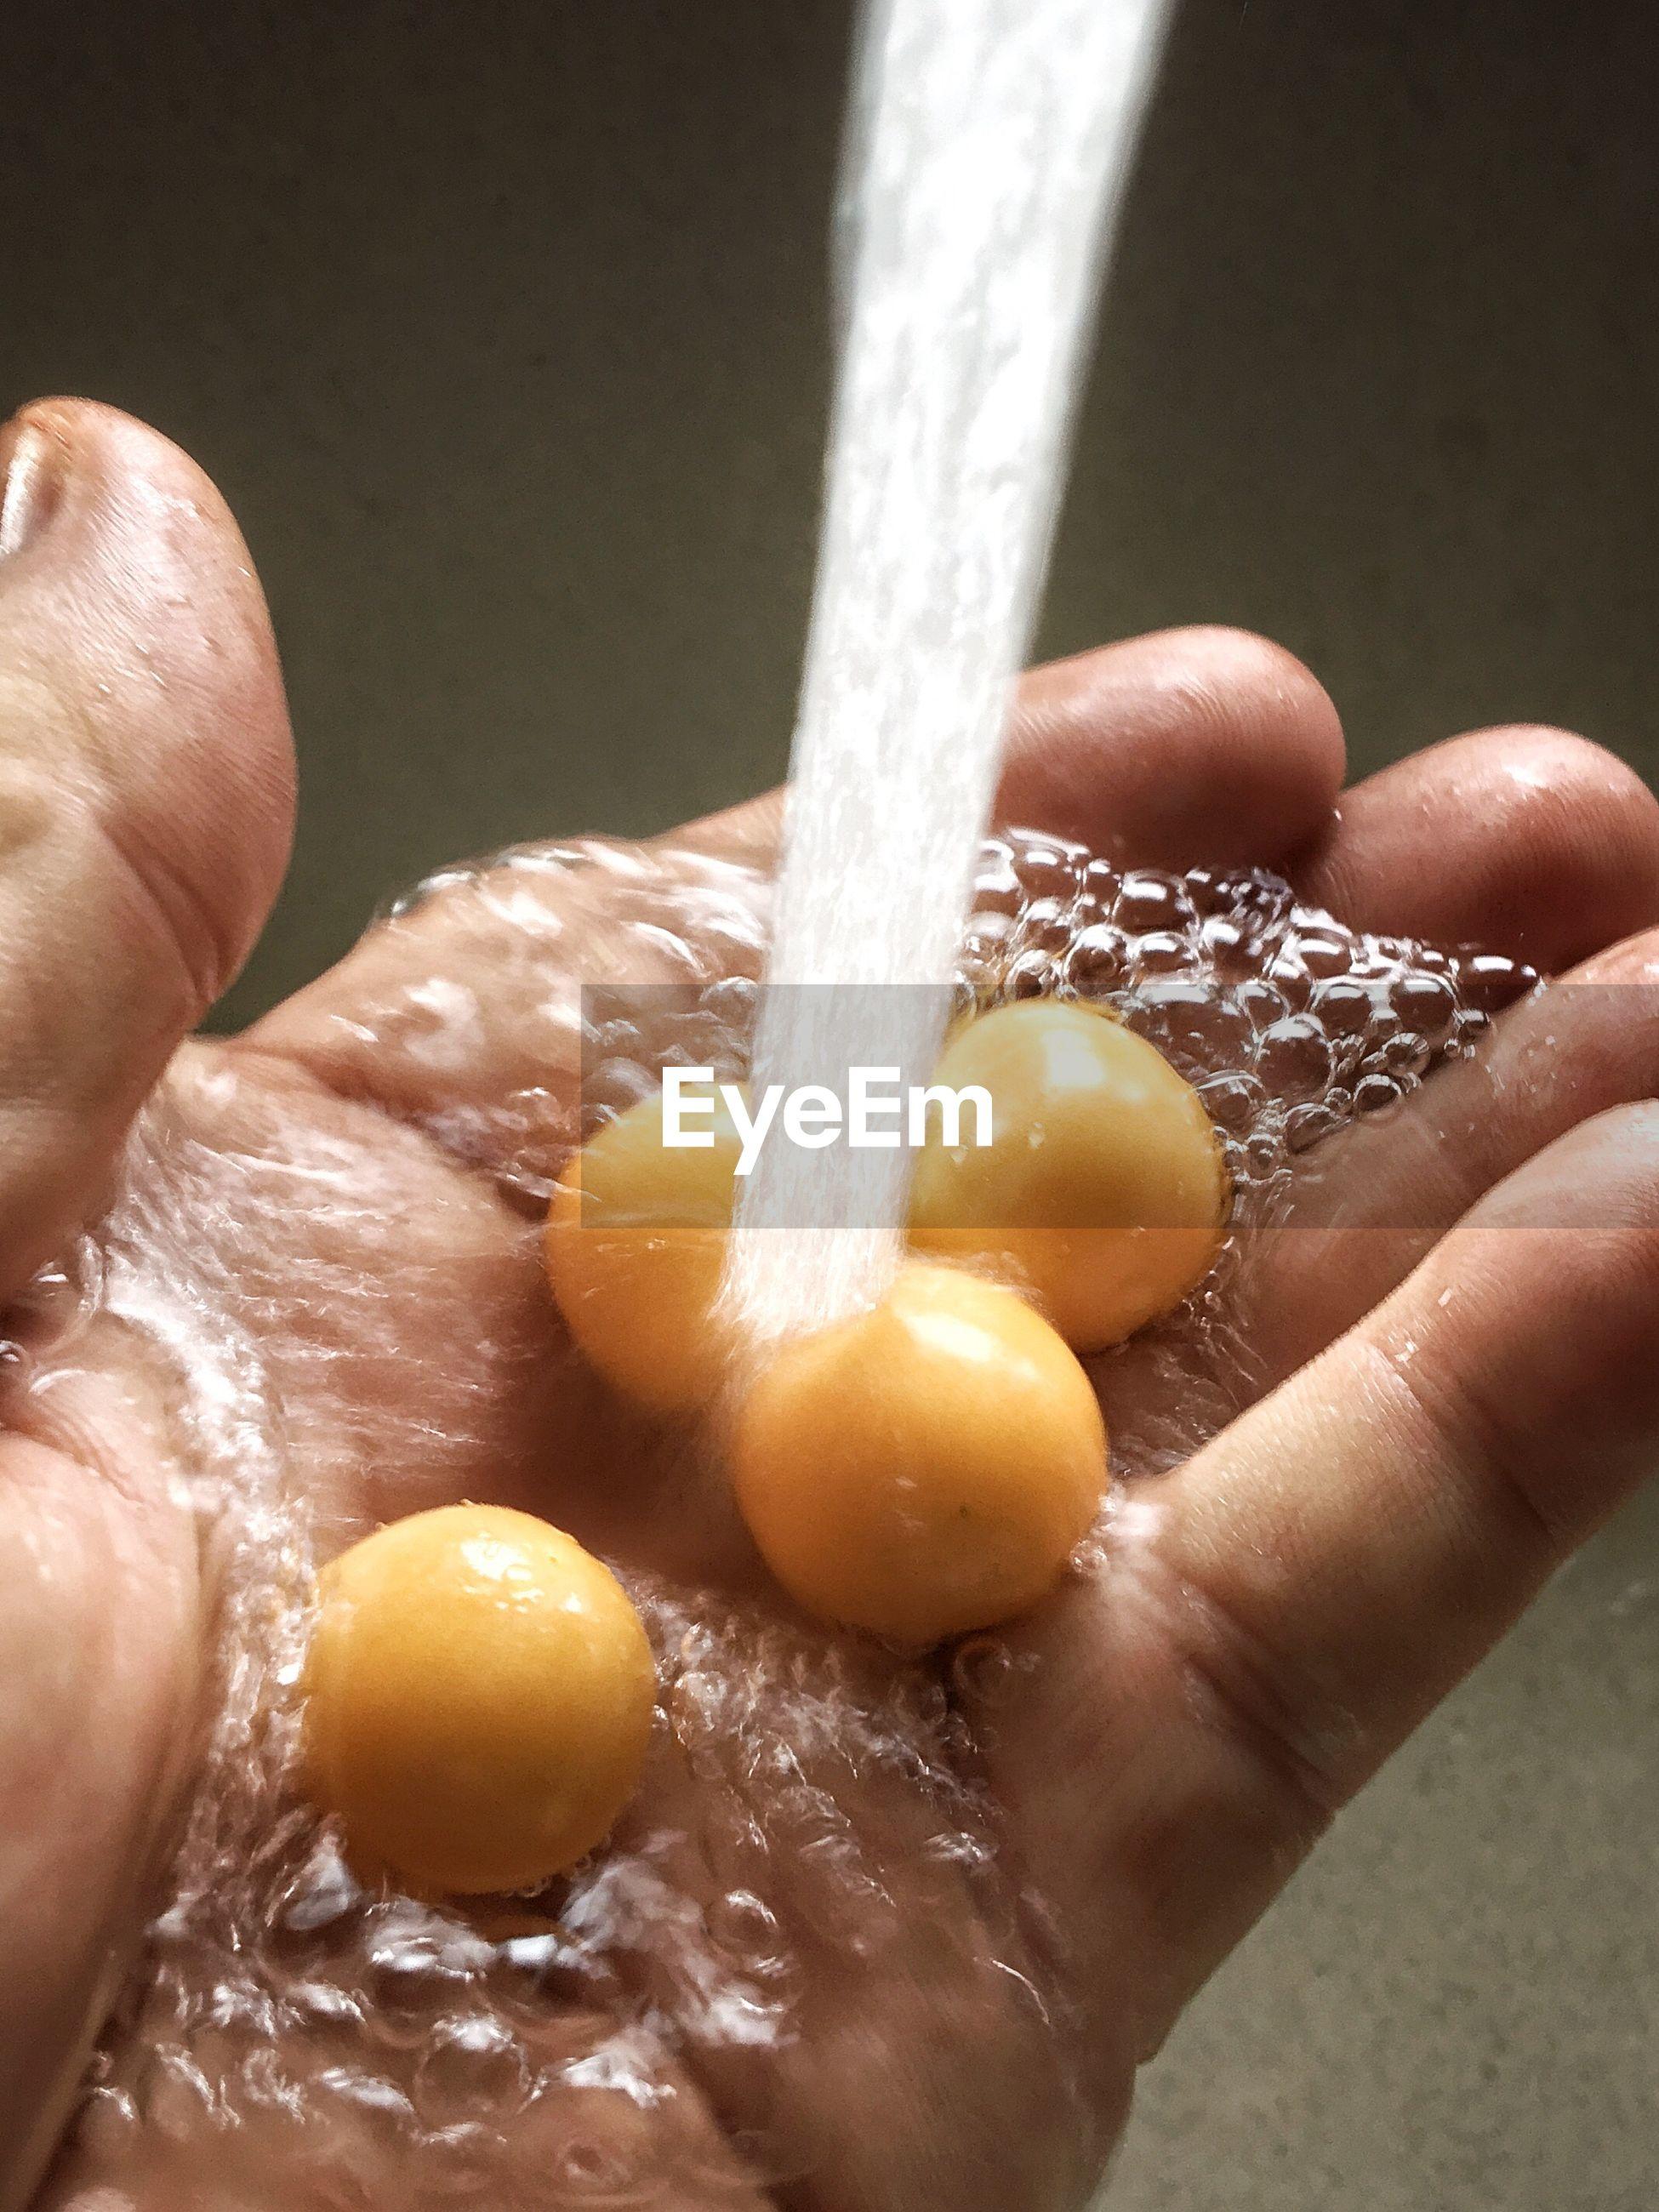 Close-up of human hand washing food under running water